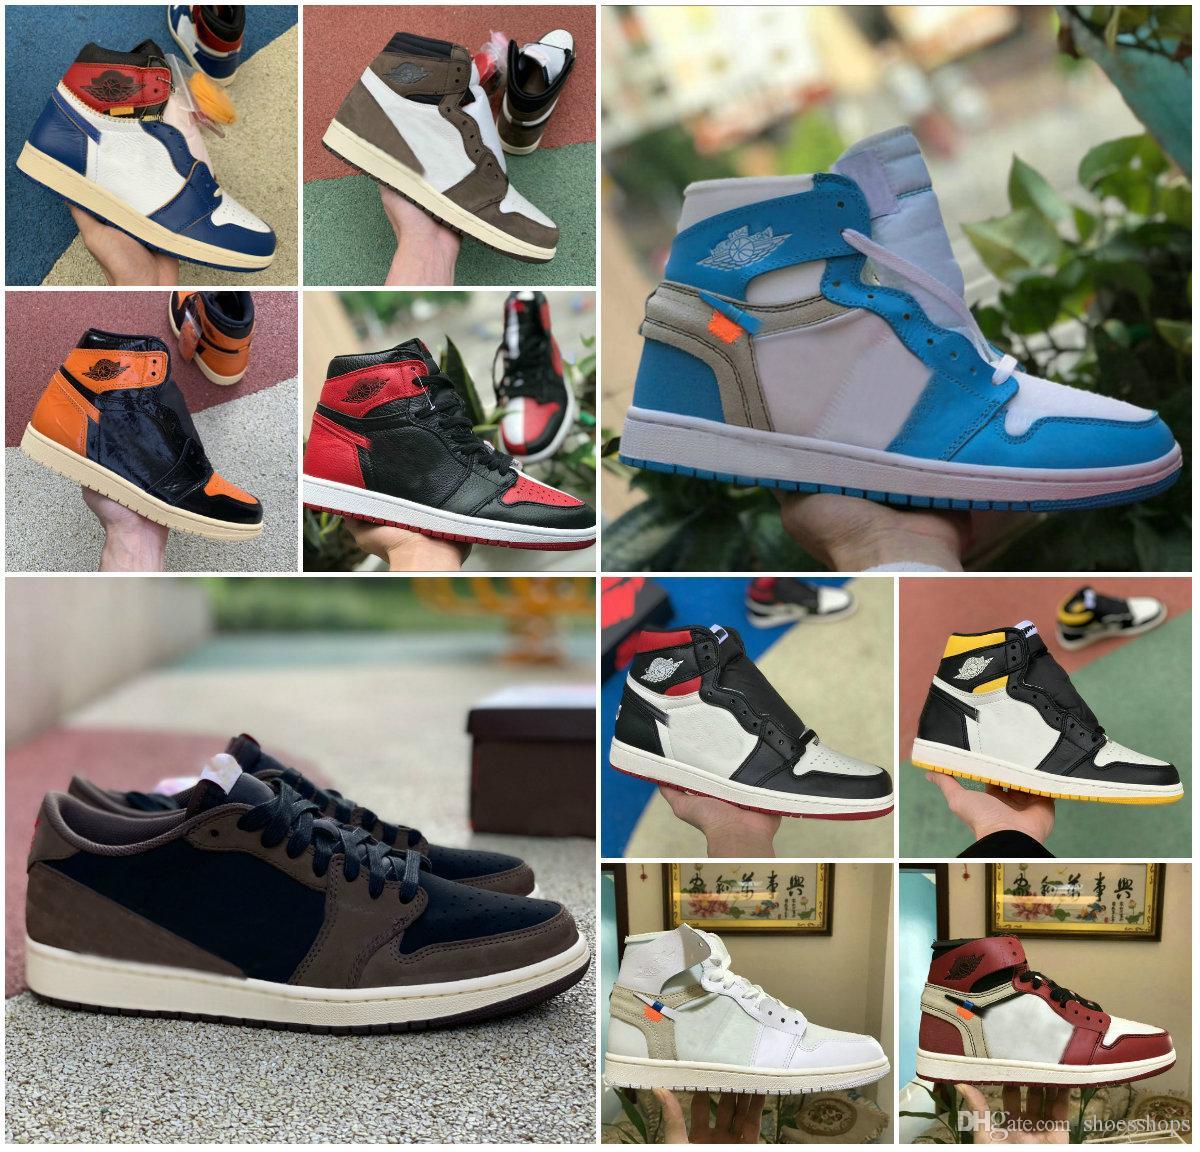 2019 Shoes New Alto 1 OG MID X Travis Scotts Basquetebol Turbo Verde Origin Story Gs Banned NRG X Retroes União 1s Unc Branco Azul Low Shoes